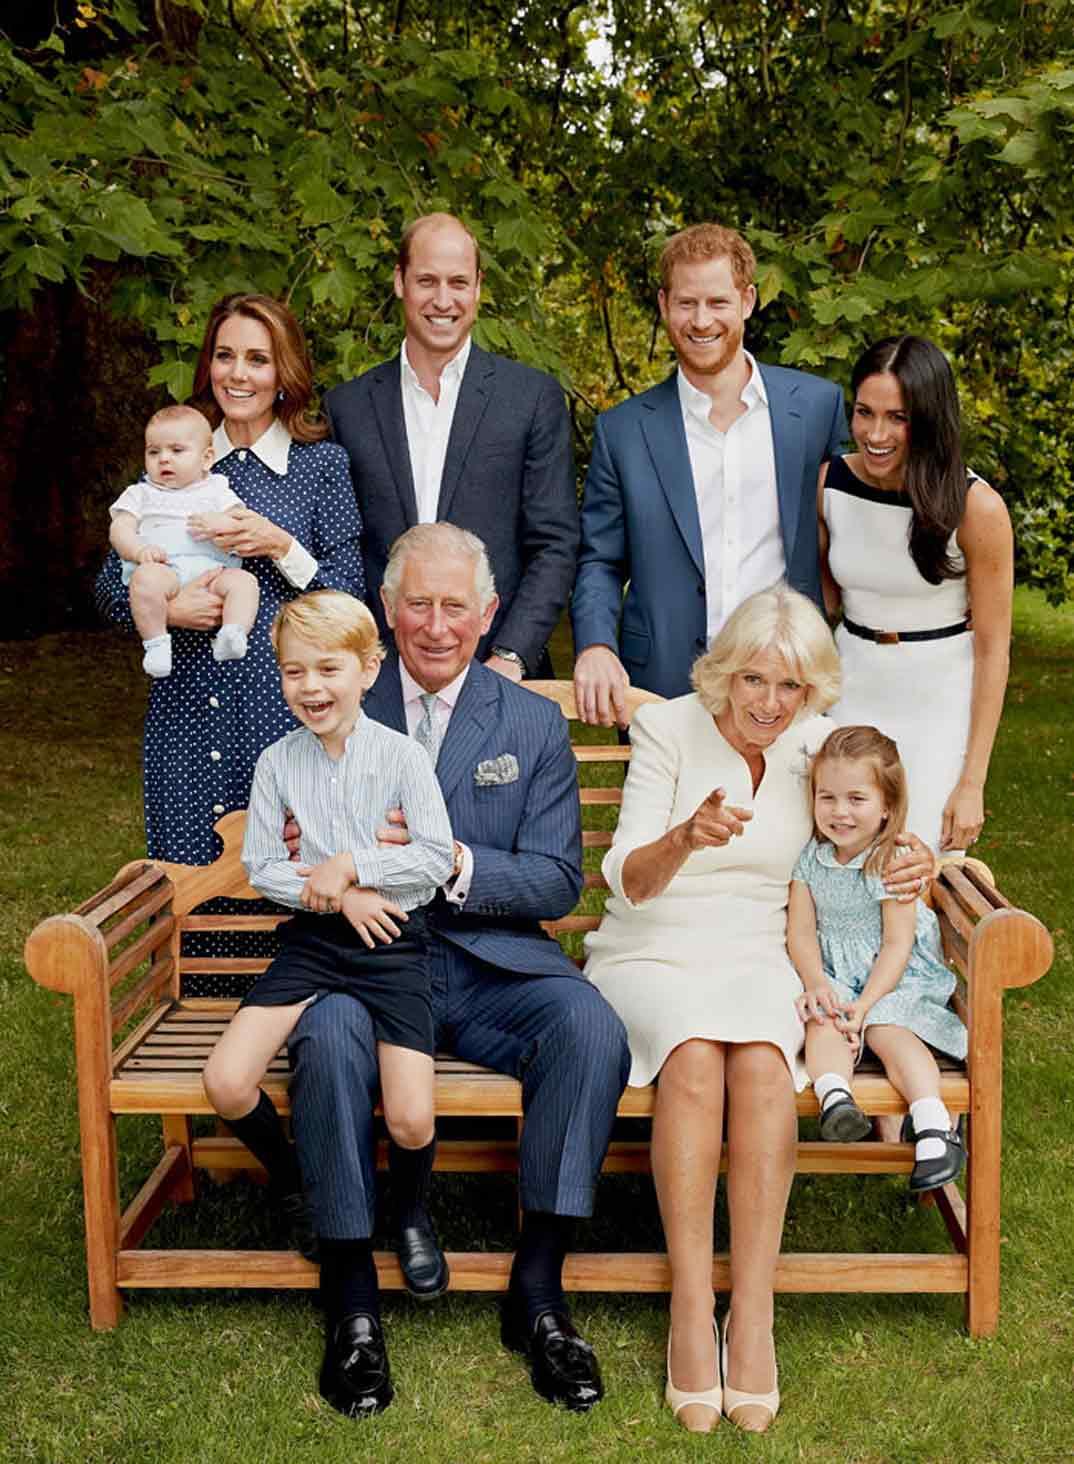 Príncipe Carlos de Inglaterra - 70 cumpleaños © Chris Jackson / Clarence House